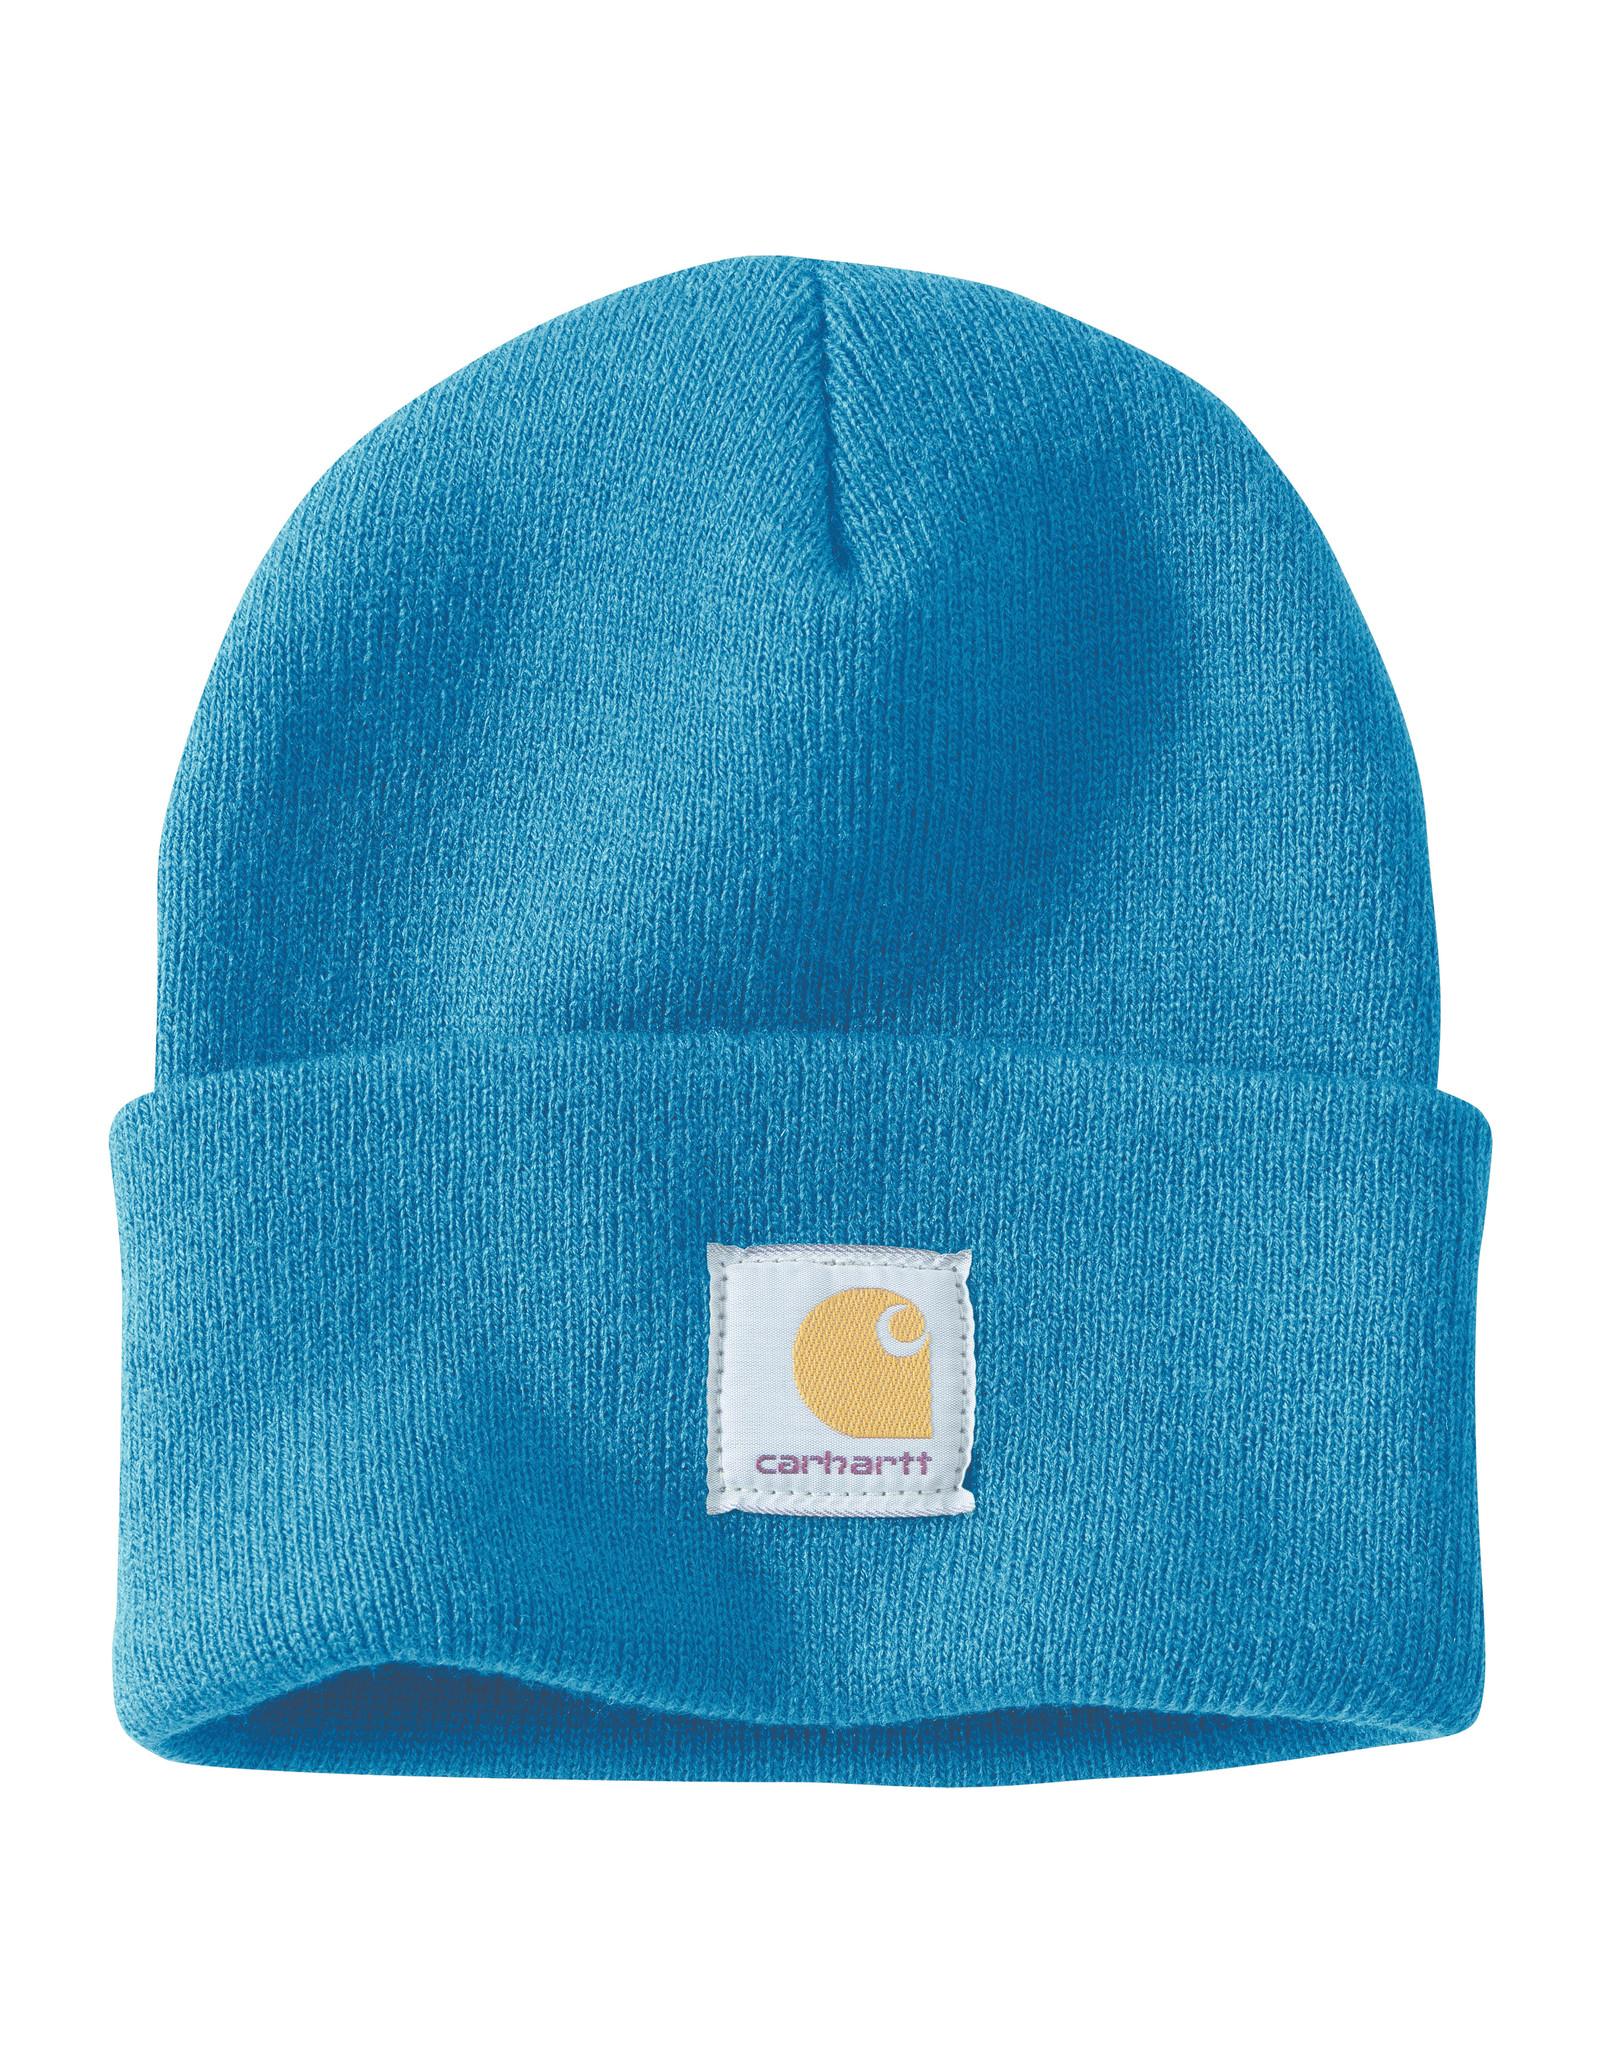 Carhartt Carhartt A18 Toque - Ocean Blue